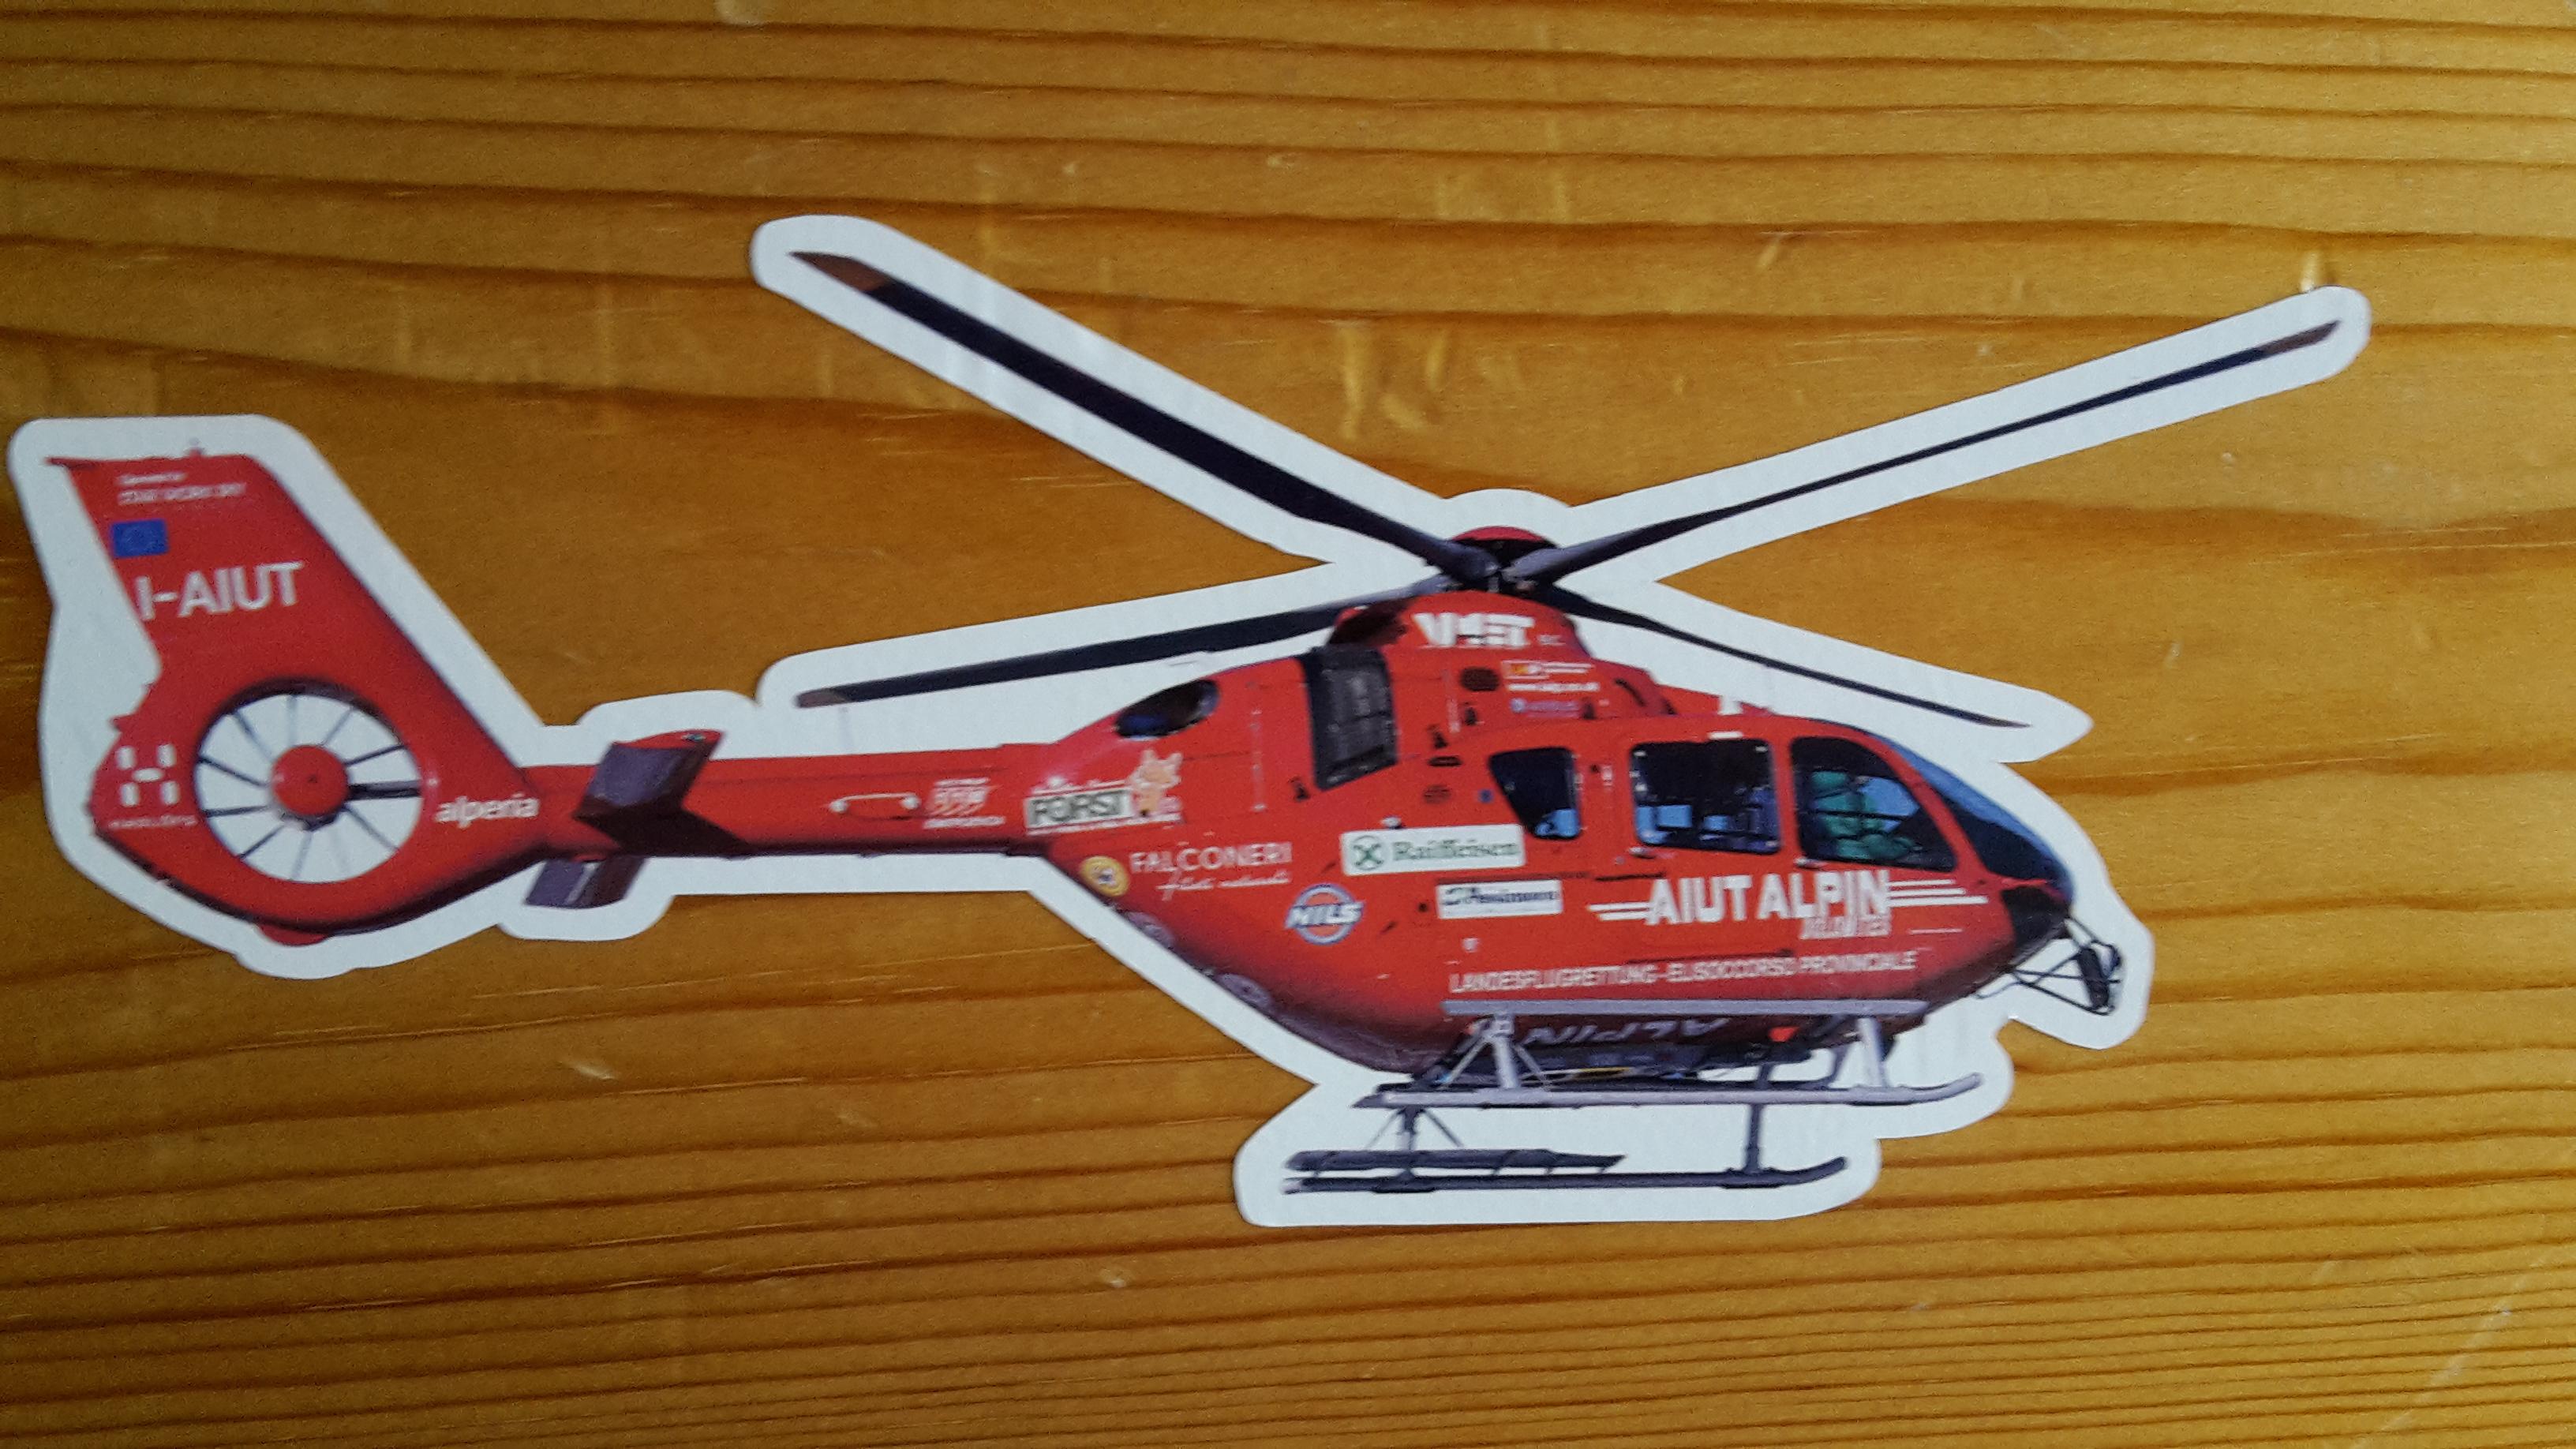 Elicottero 450 : File:elicottero aiut alpin dolomites adesivo.jpg wikimedia commons